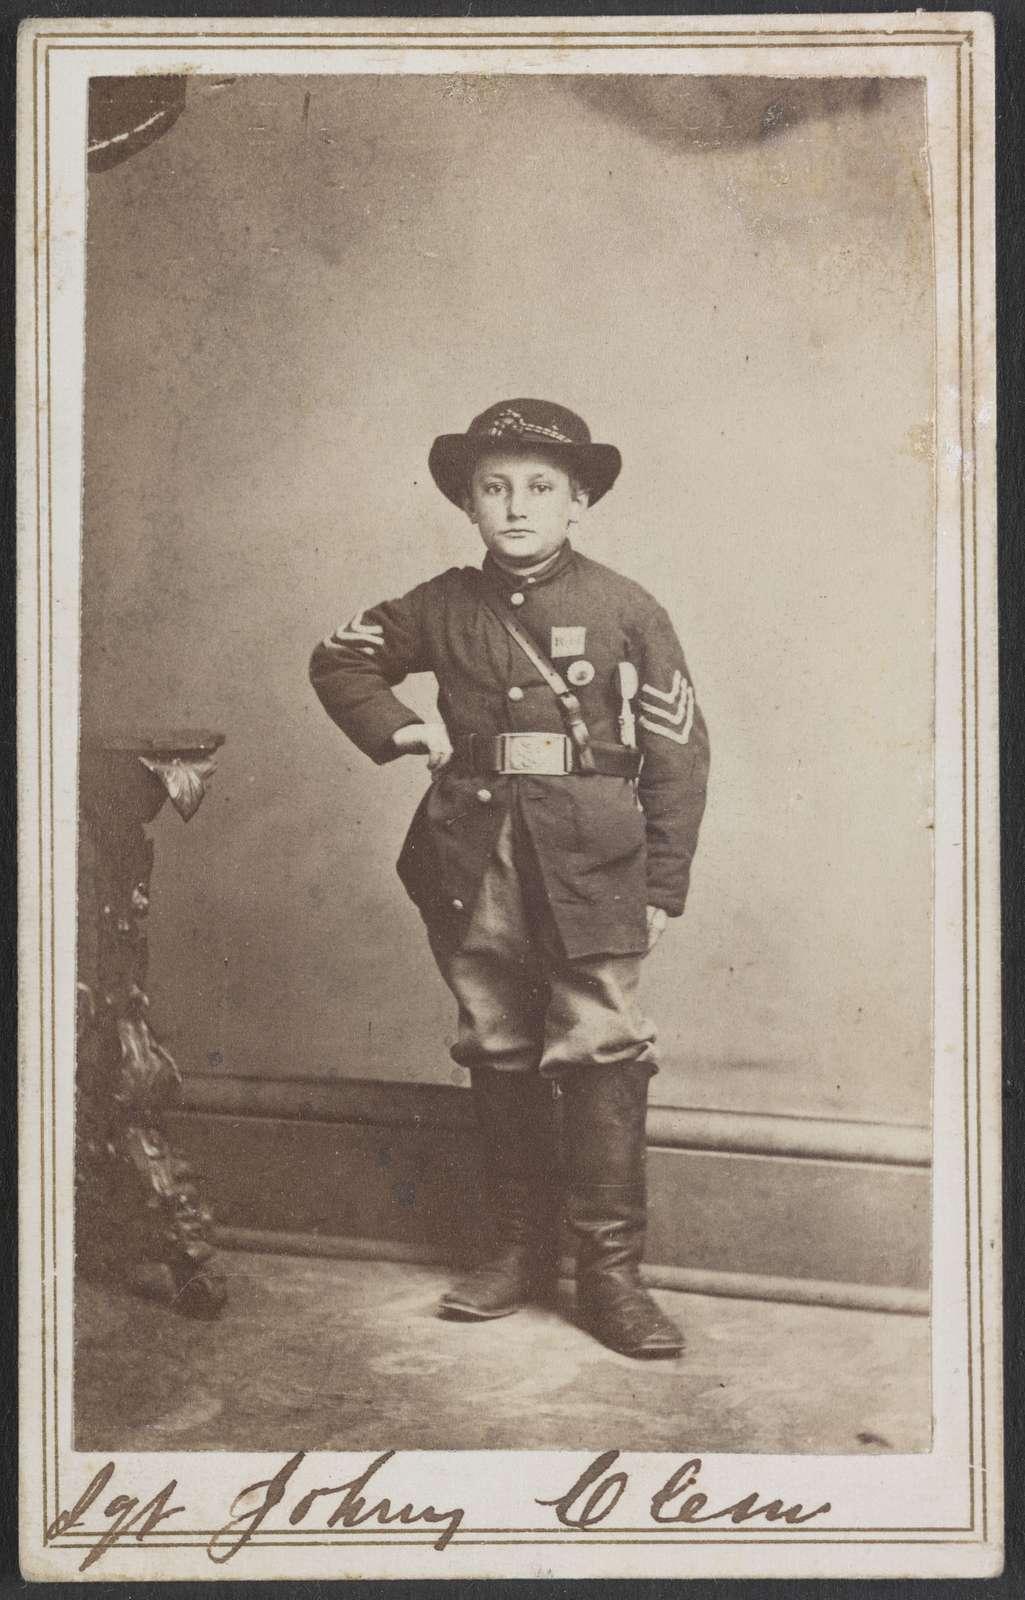 Union drummer boy John Clem,children,military,Point Lookout,Tennessee,TN,1863